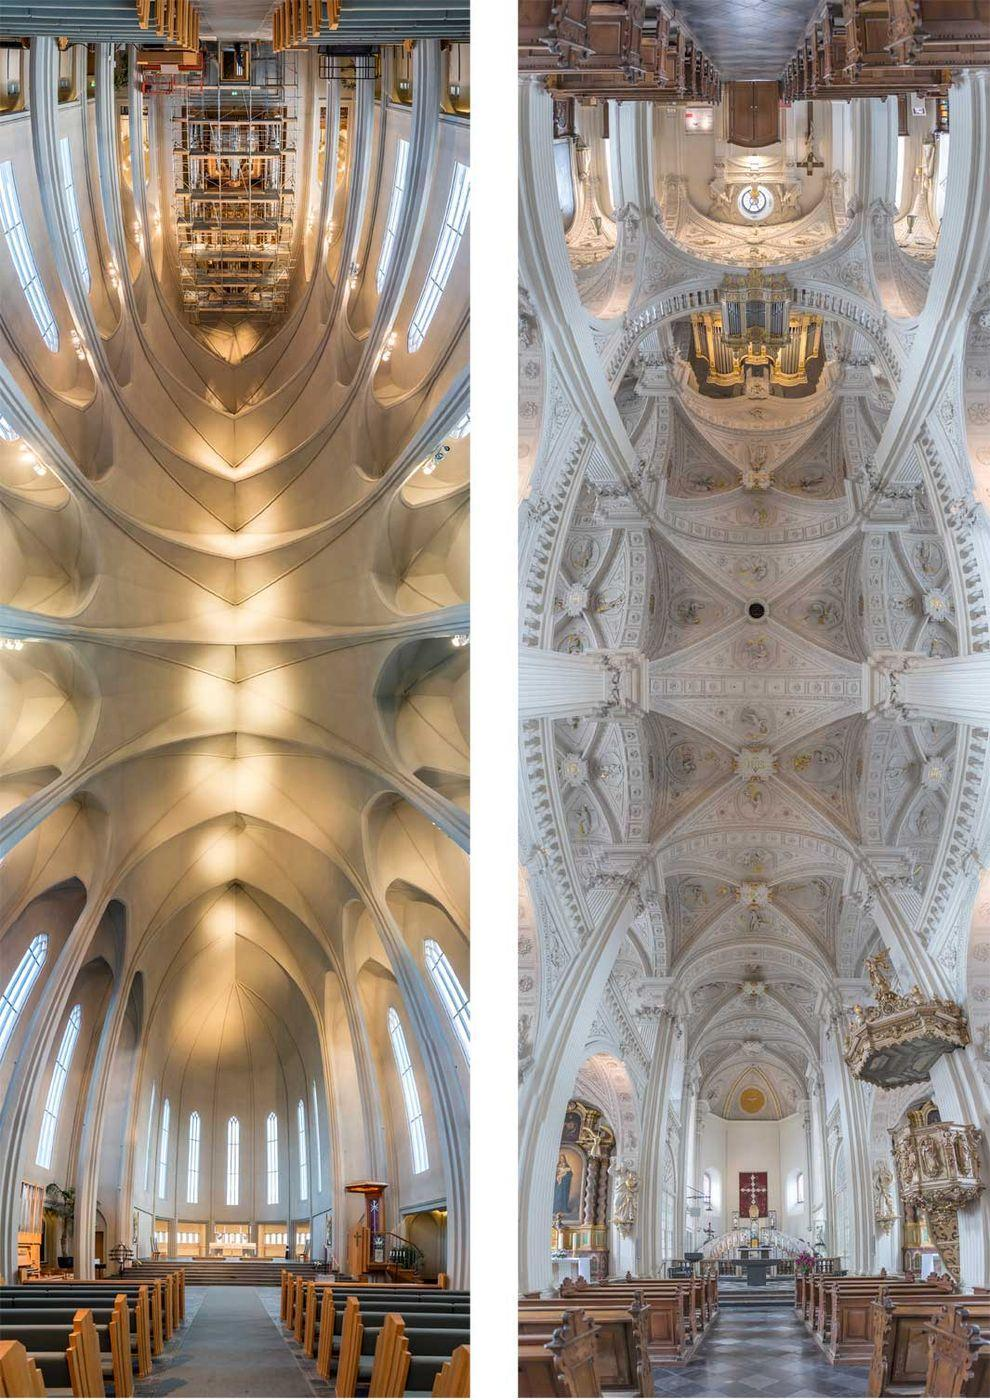 Church02 Потрясающие снимки храмов от входа до алтаря в одном фото